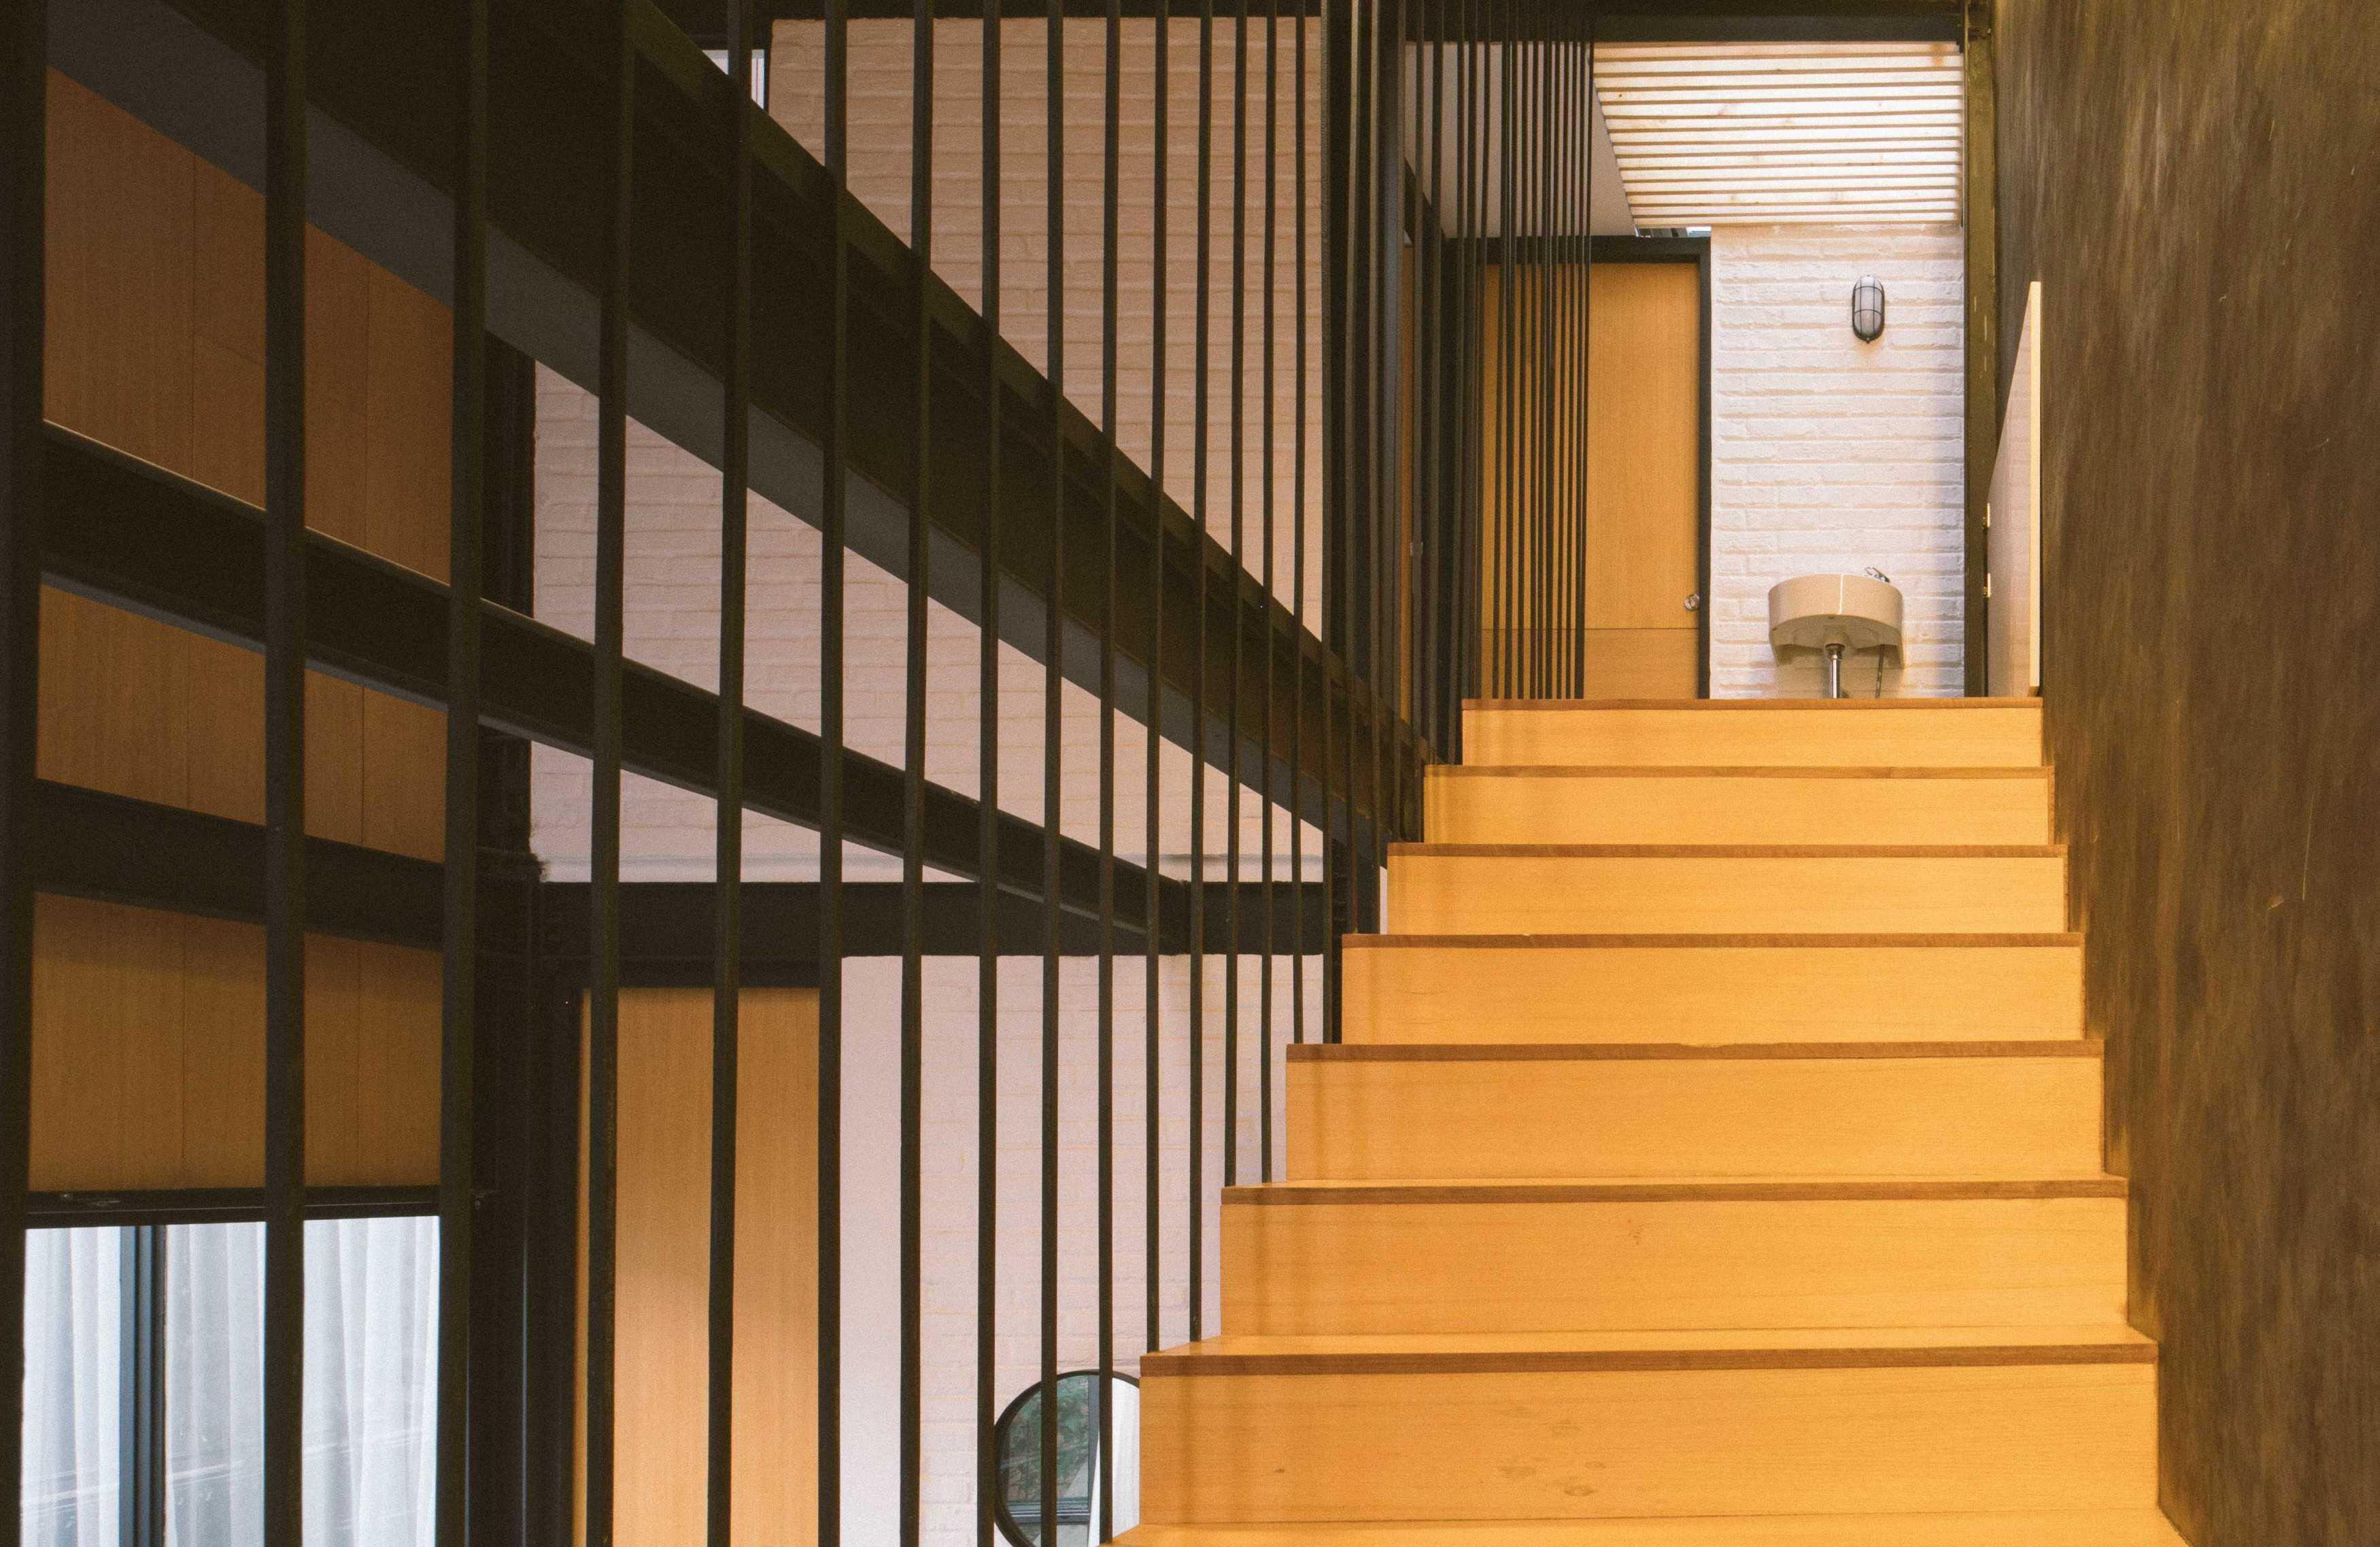 Mahastudio & Partner Grohouse Ragemanunggal, Kec. Setu, Bekasi, Jawa Barat 17320, Indonesia Ragemanunggal, Kec. Setu, Bekasi, Jawa Barat 17320, Indonesia Mahastudio-Partner-Grohouse   74548